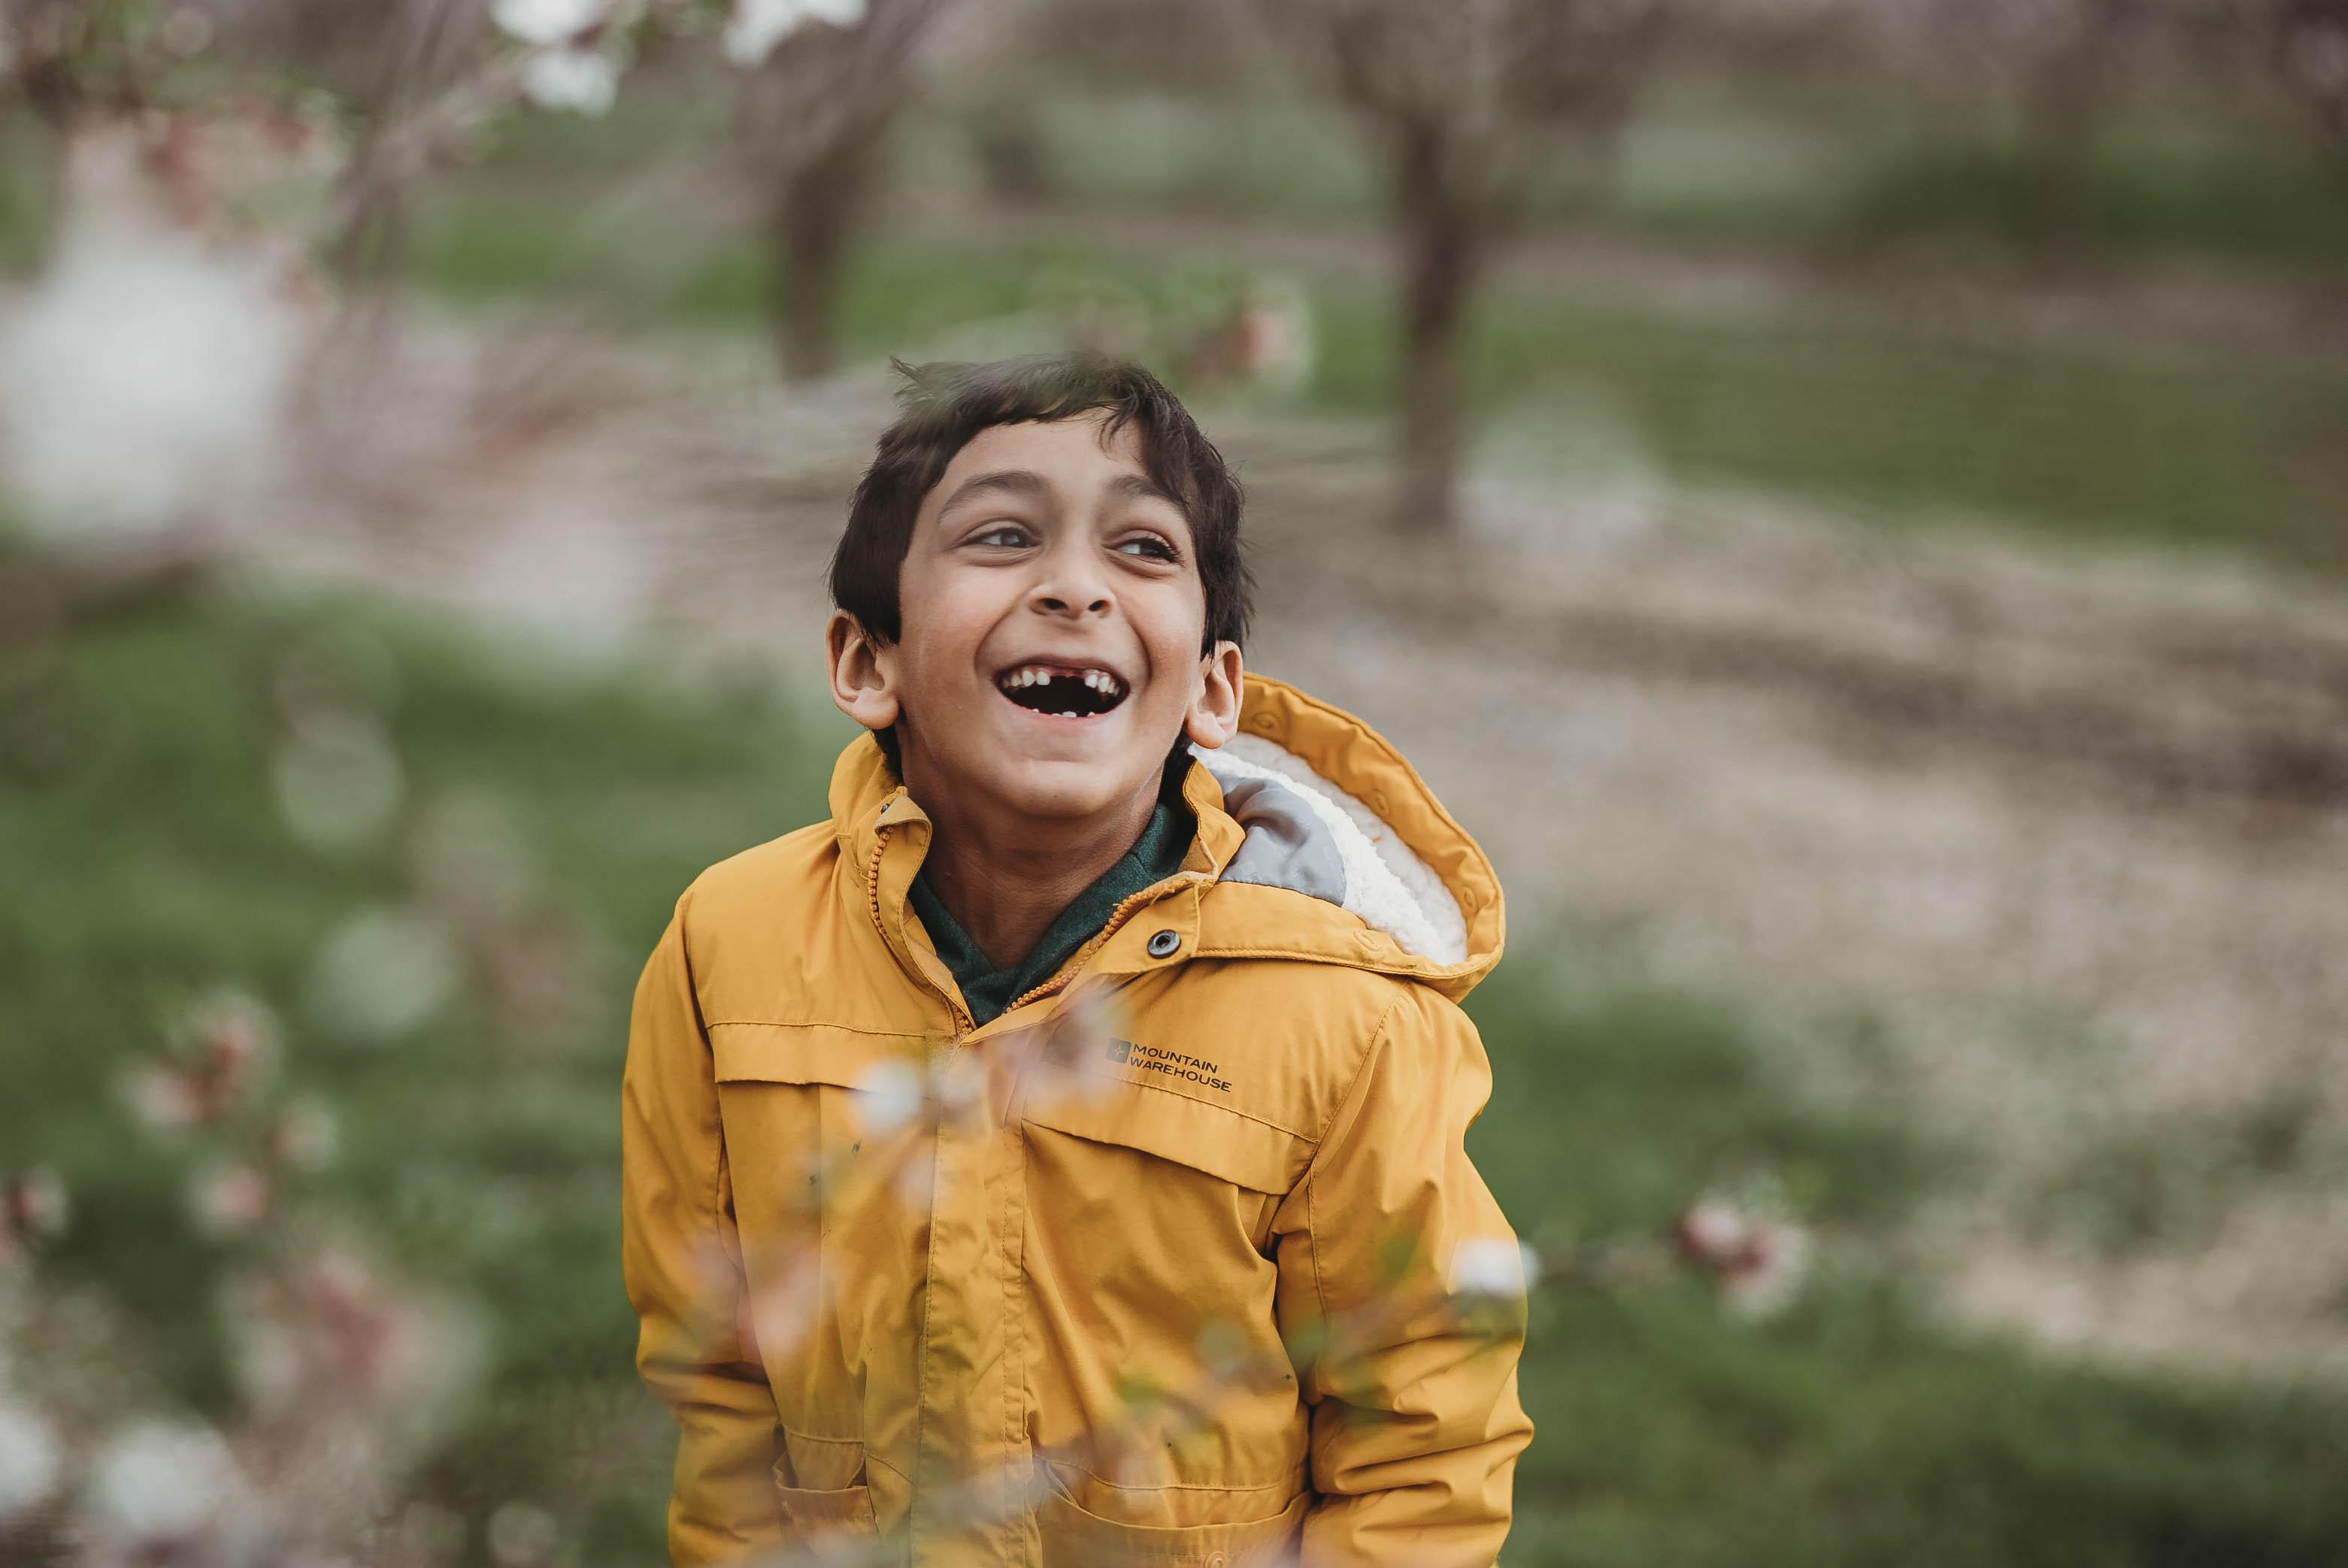 boy in yellow jacket laughing by jyo bhamadipati